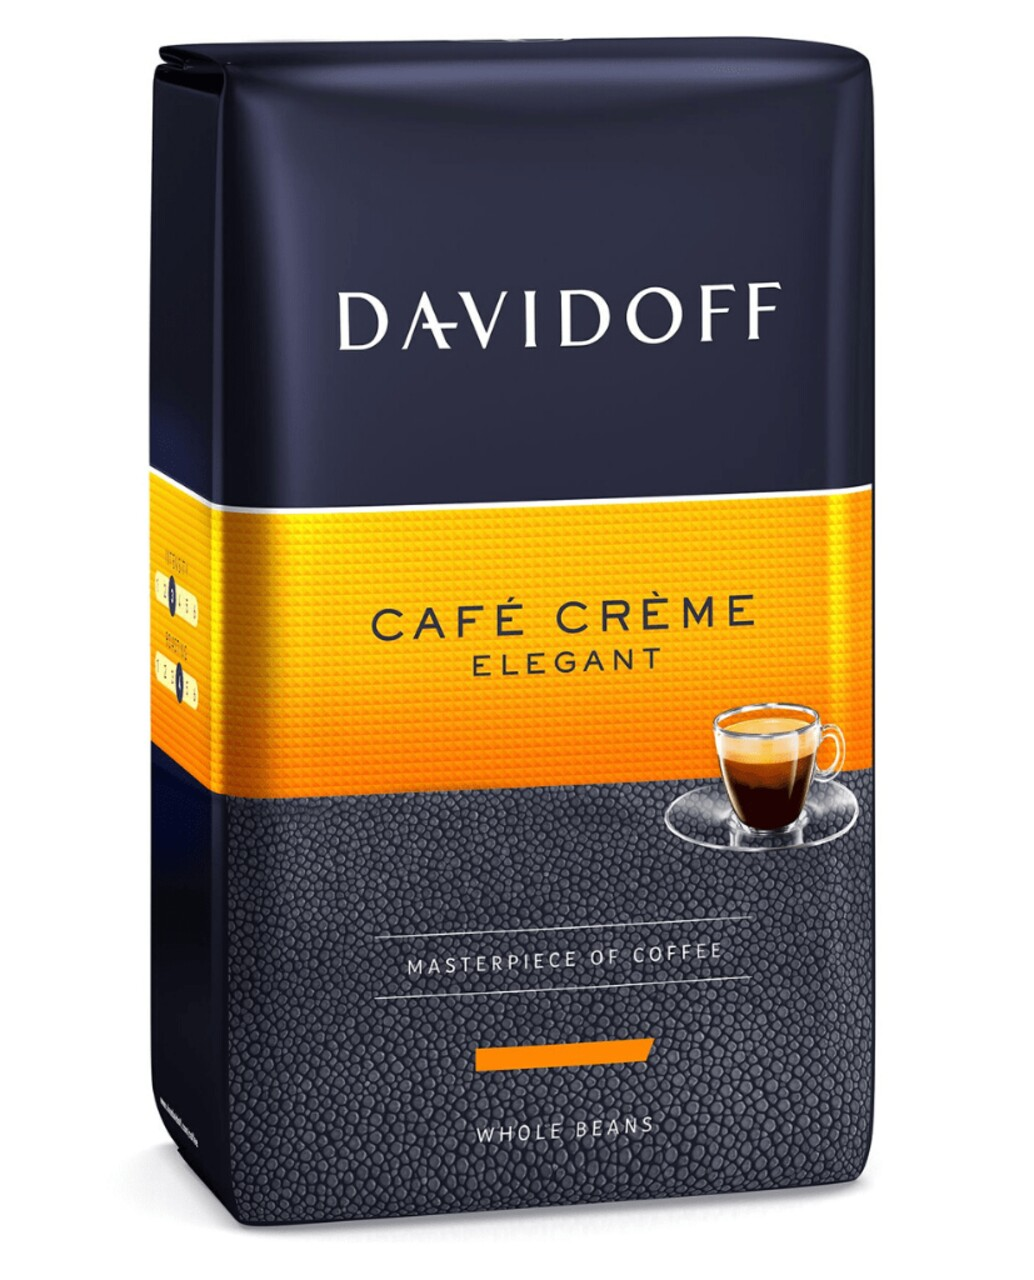 Cafea Boabe Davidoff Caffe Creme 500g